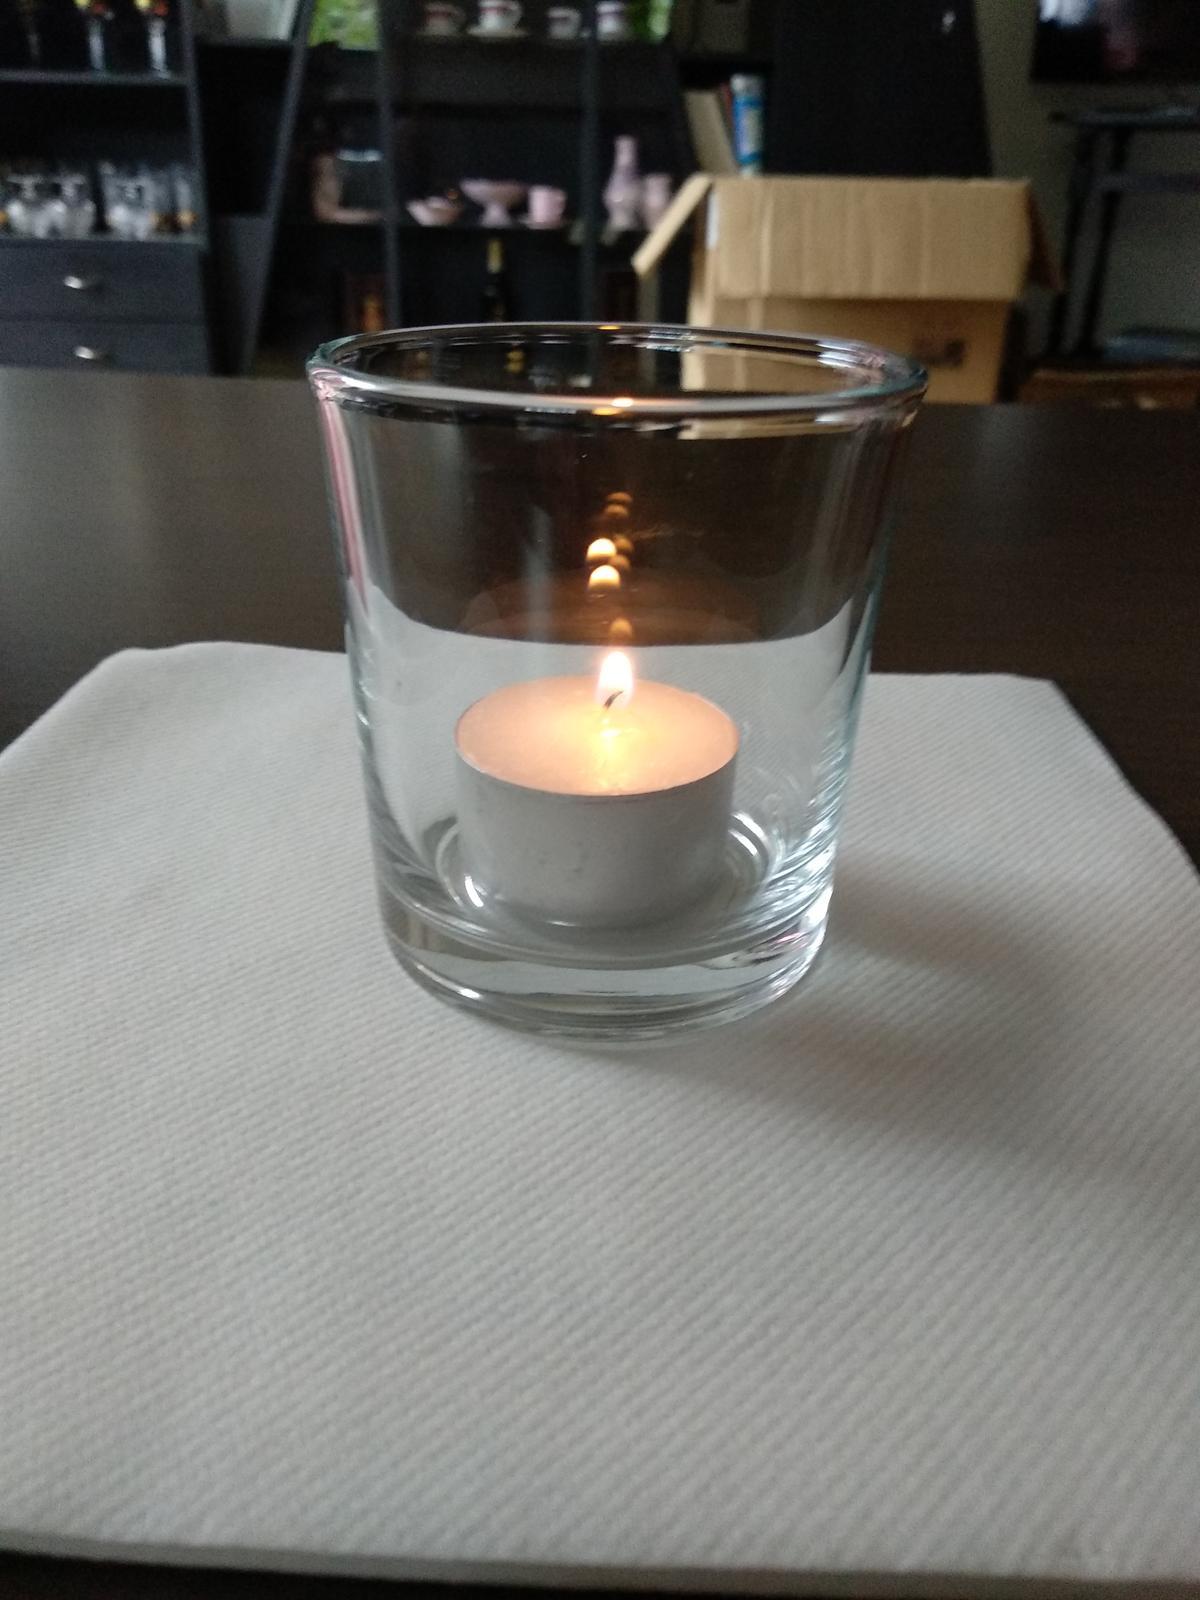 Svietniky sklenene - Obrázok č. 1